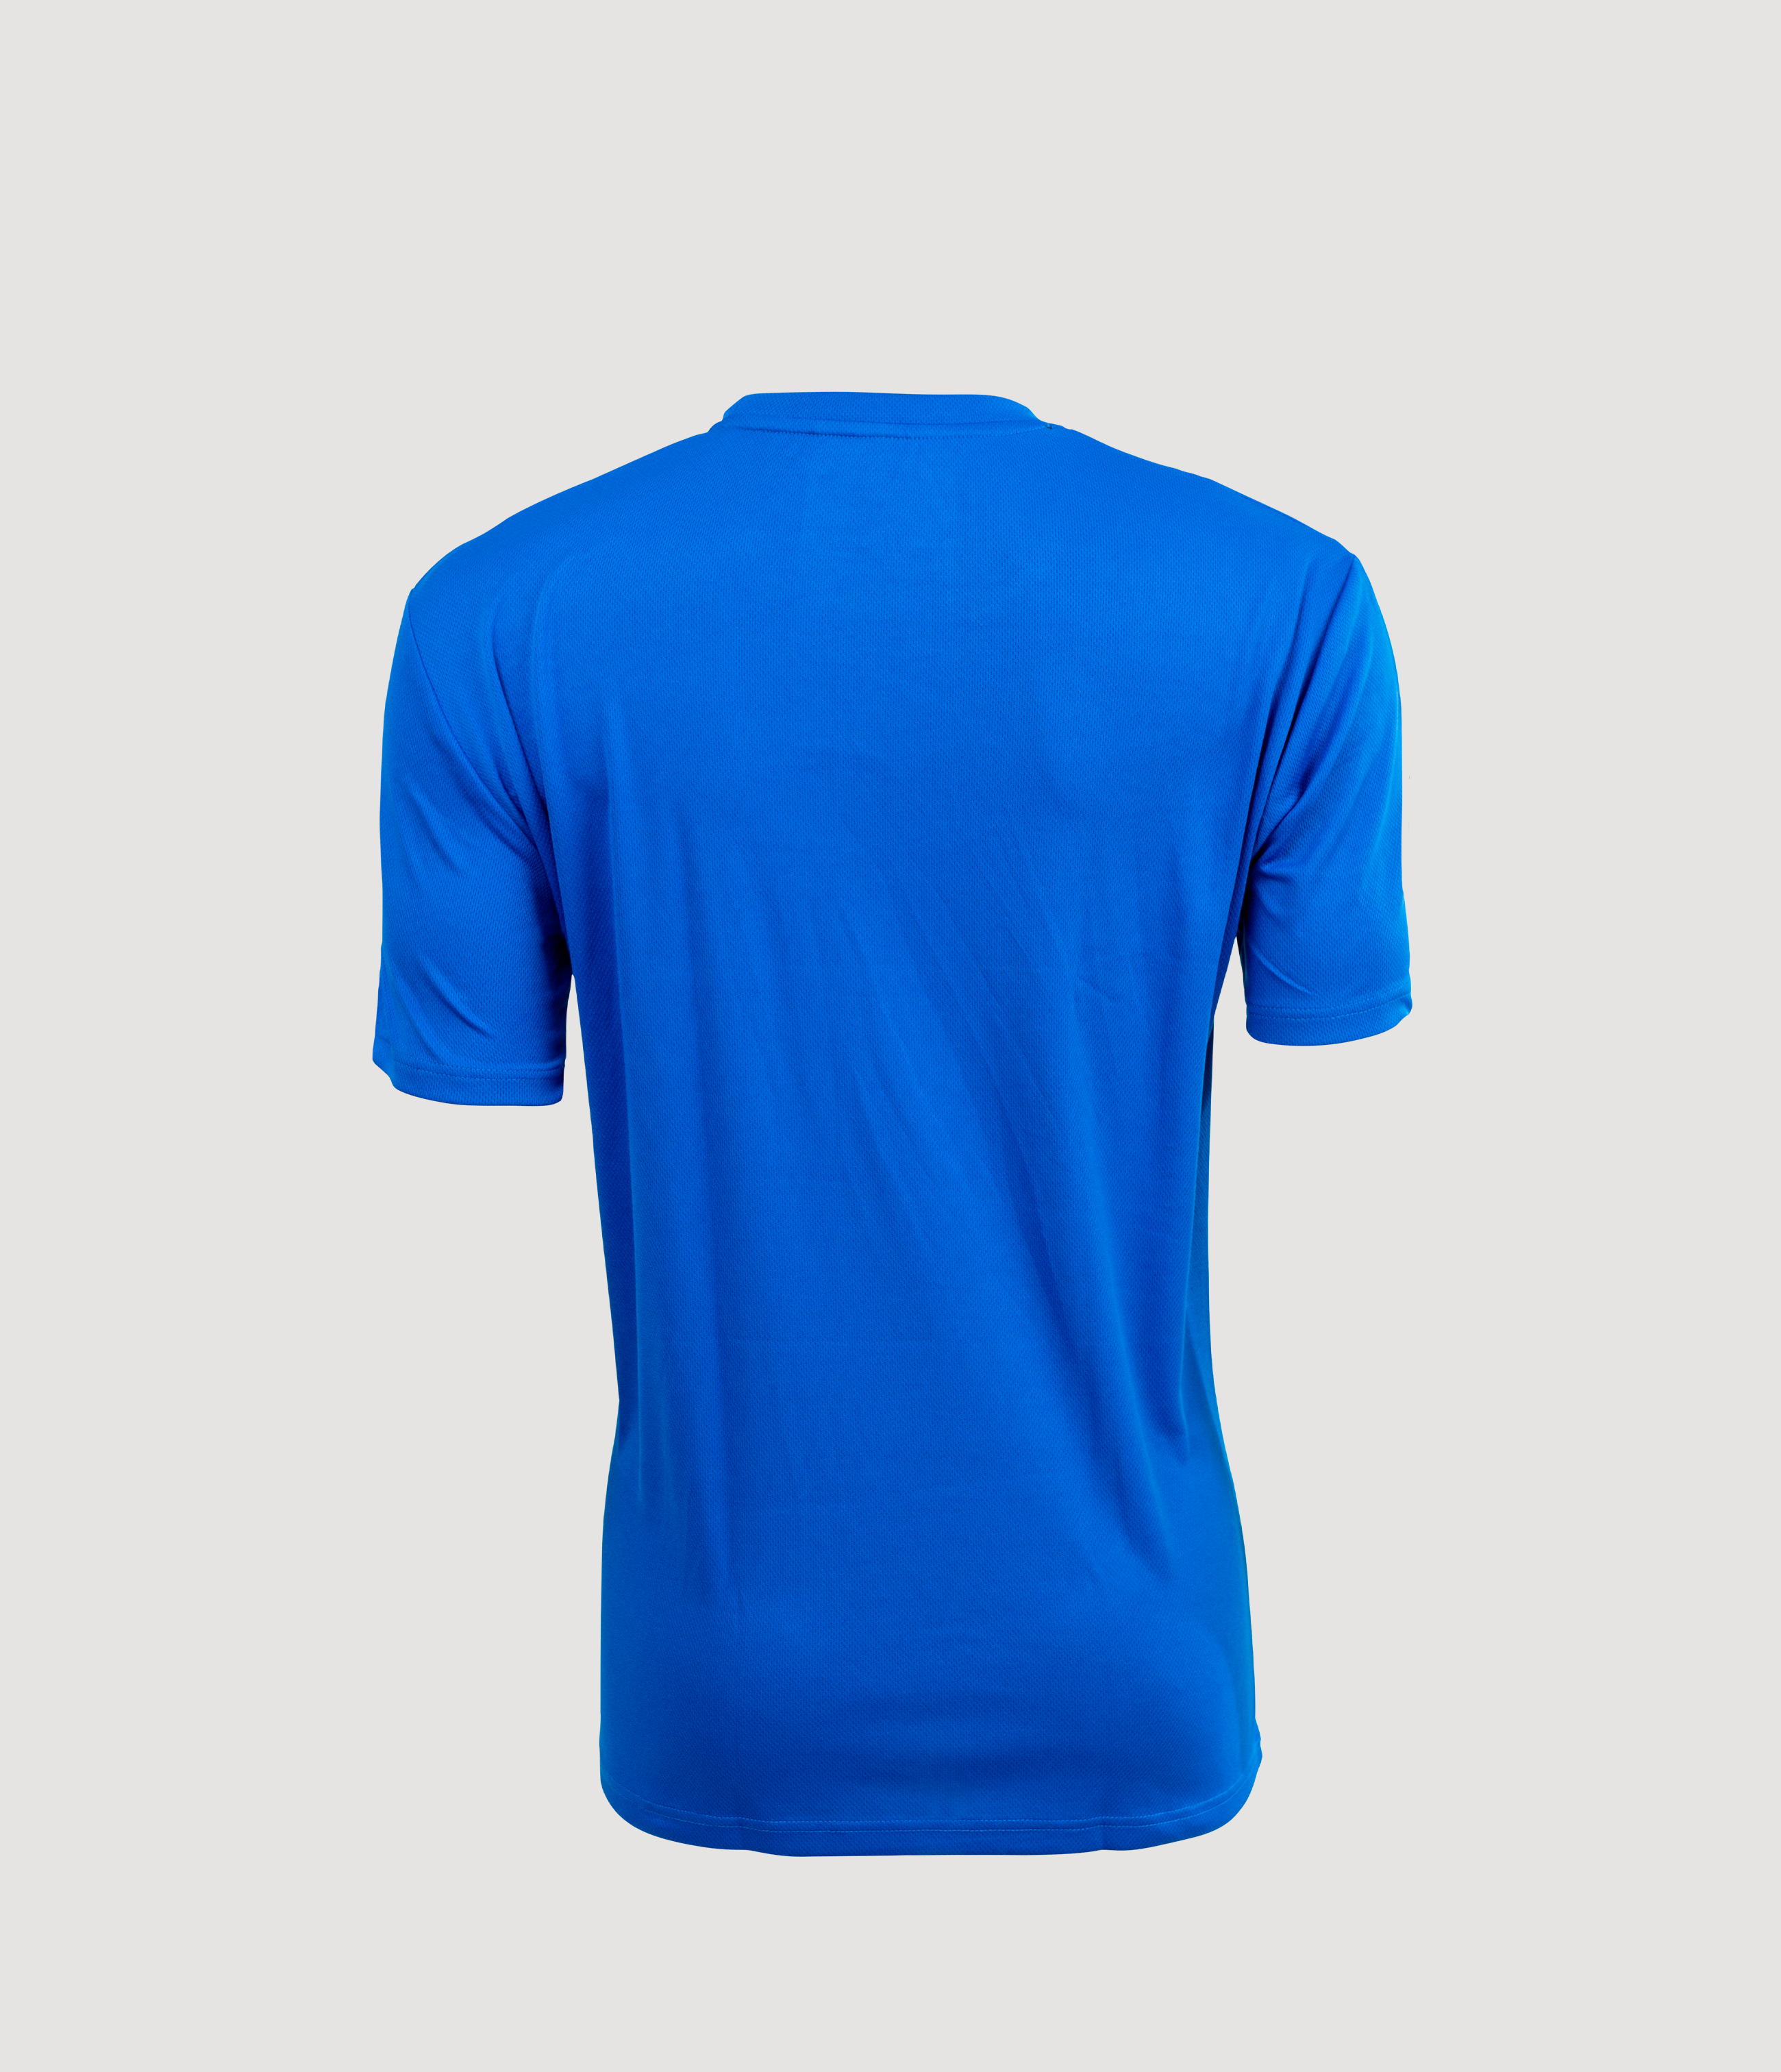 Atlanta II Training Shirt Royal Blue Back